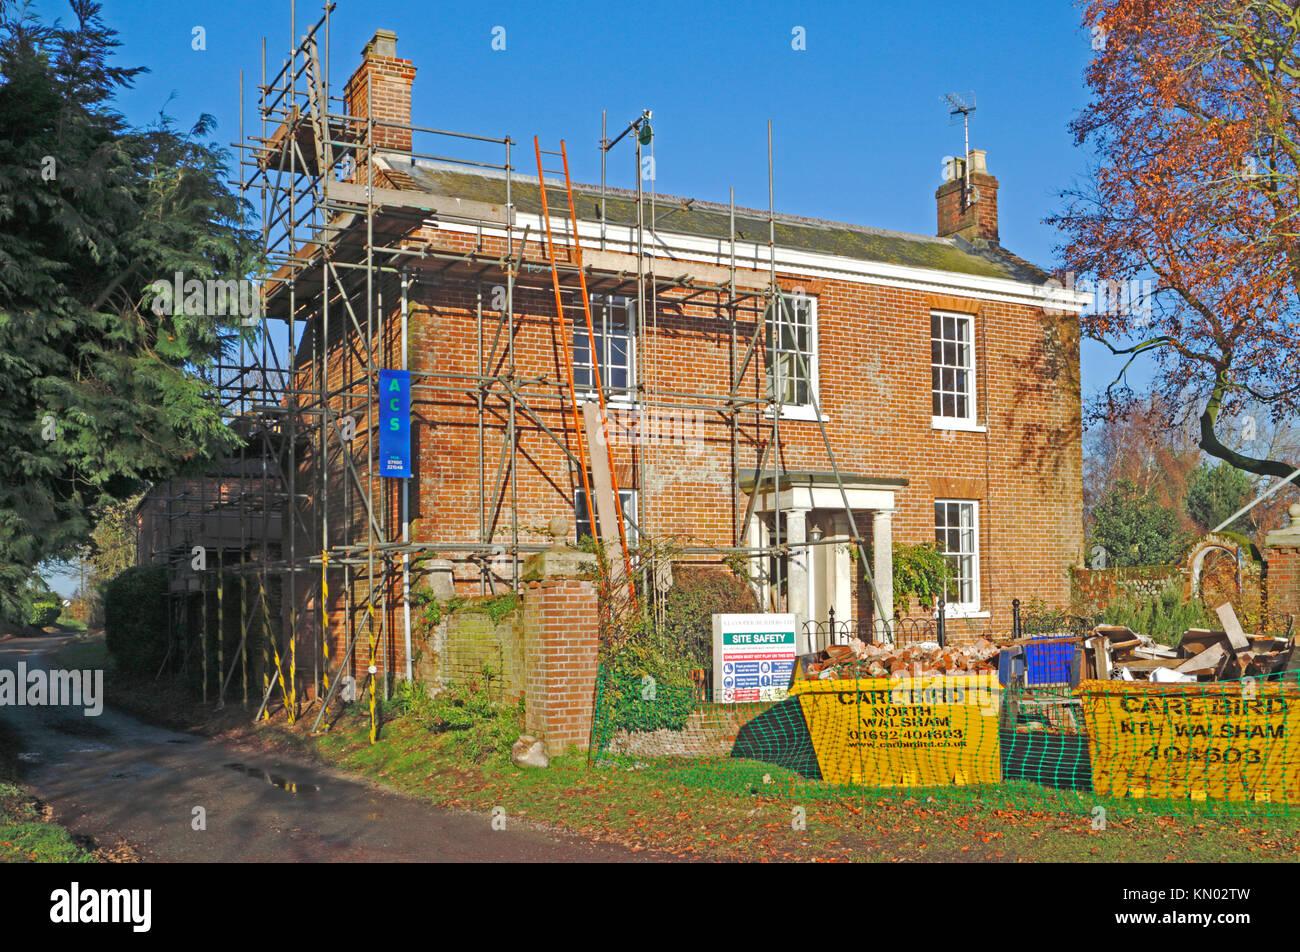 A country house undergoing refurbishment at Briggate, Honing, Norfolk, England, United Kingdom. - Stock Image